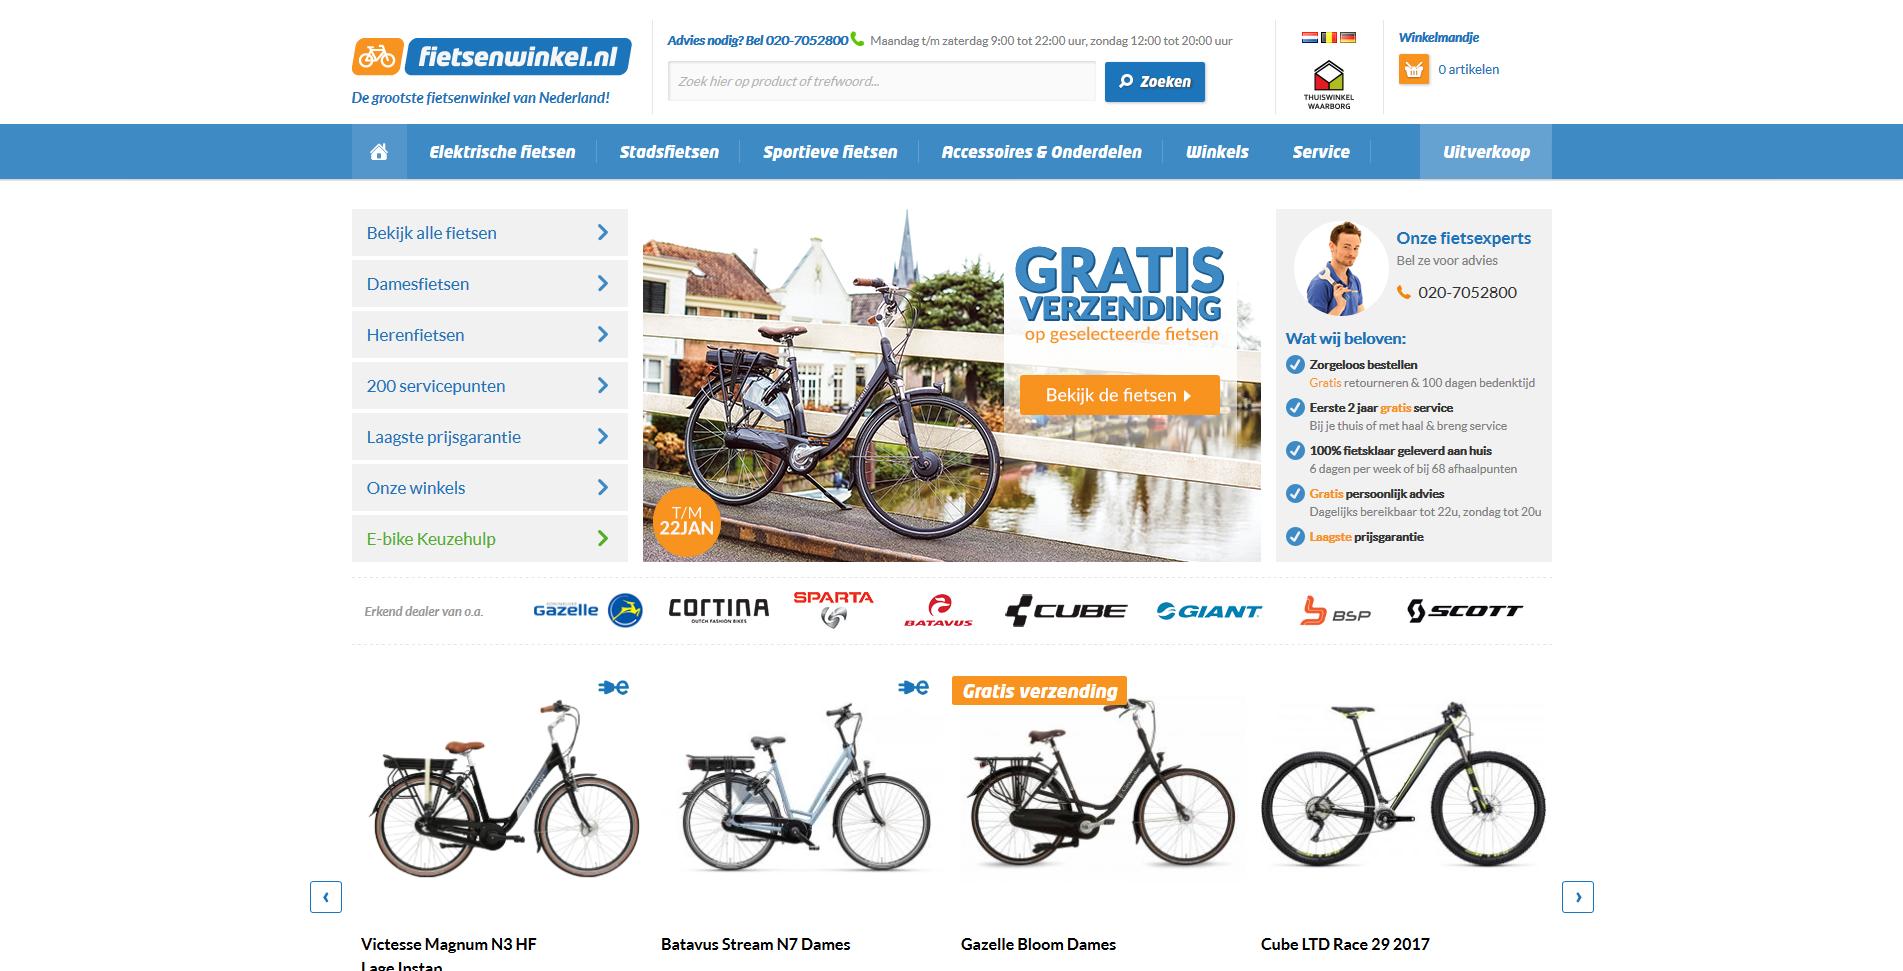 Fiets kopen? Vind de perfecte fiets op Fietsenwinkel.nl!